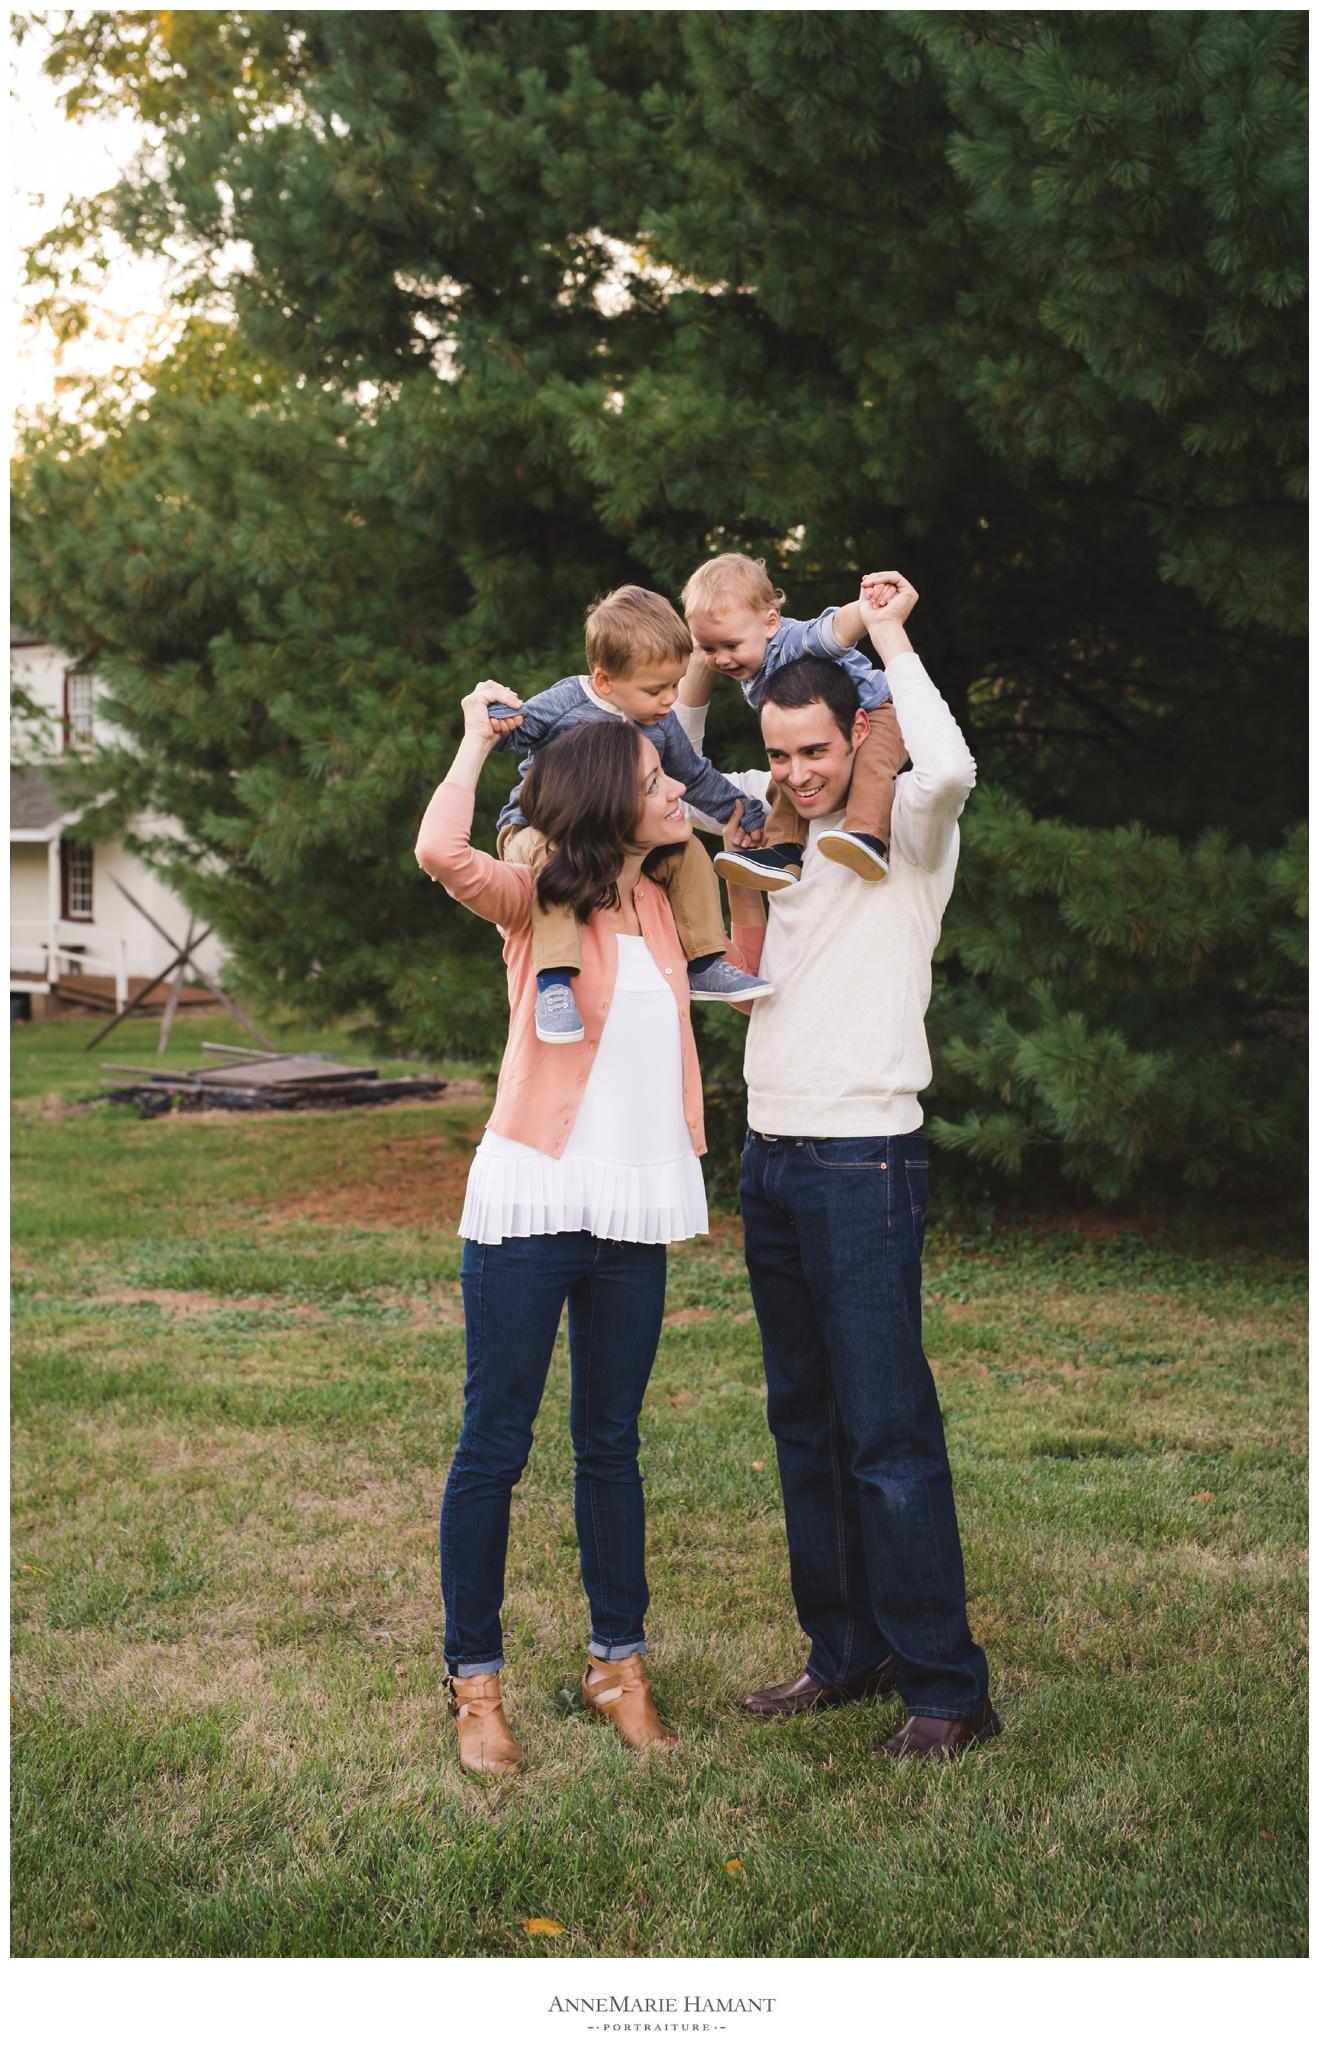 Montgomery County Philadelphia Mainline PA family photographer